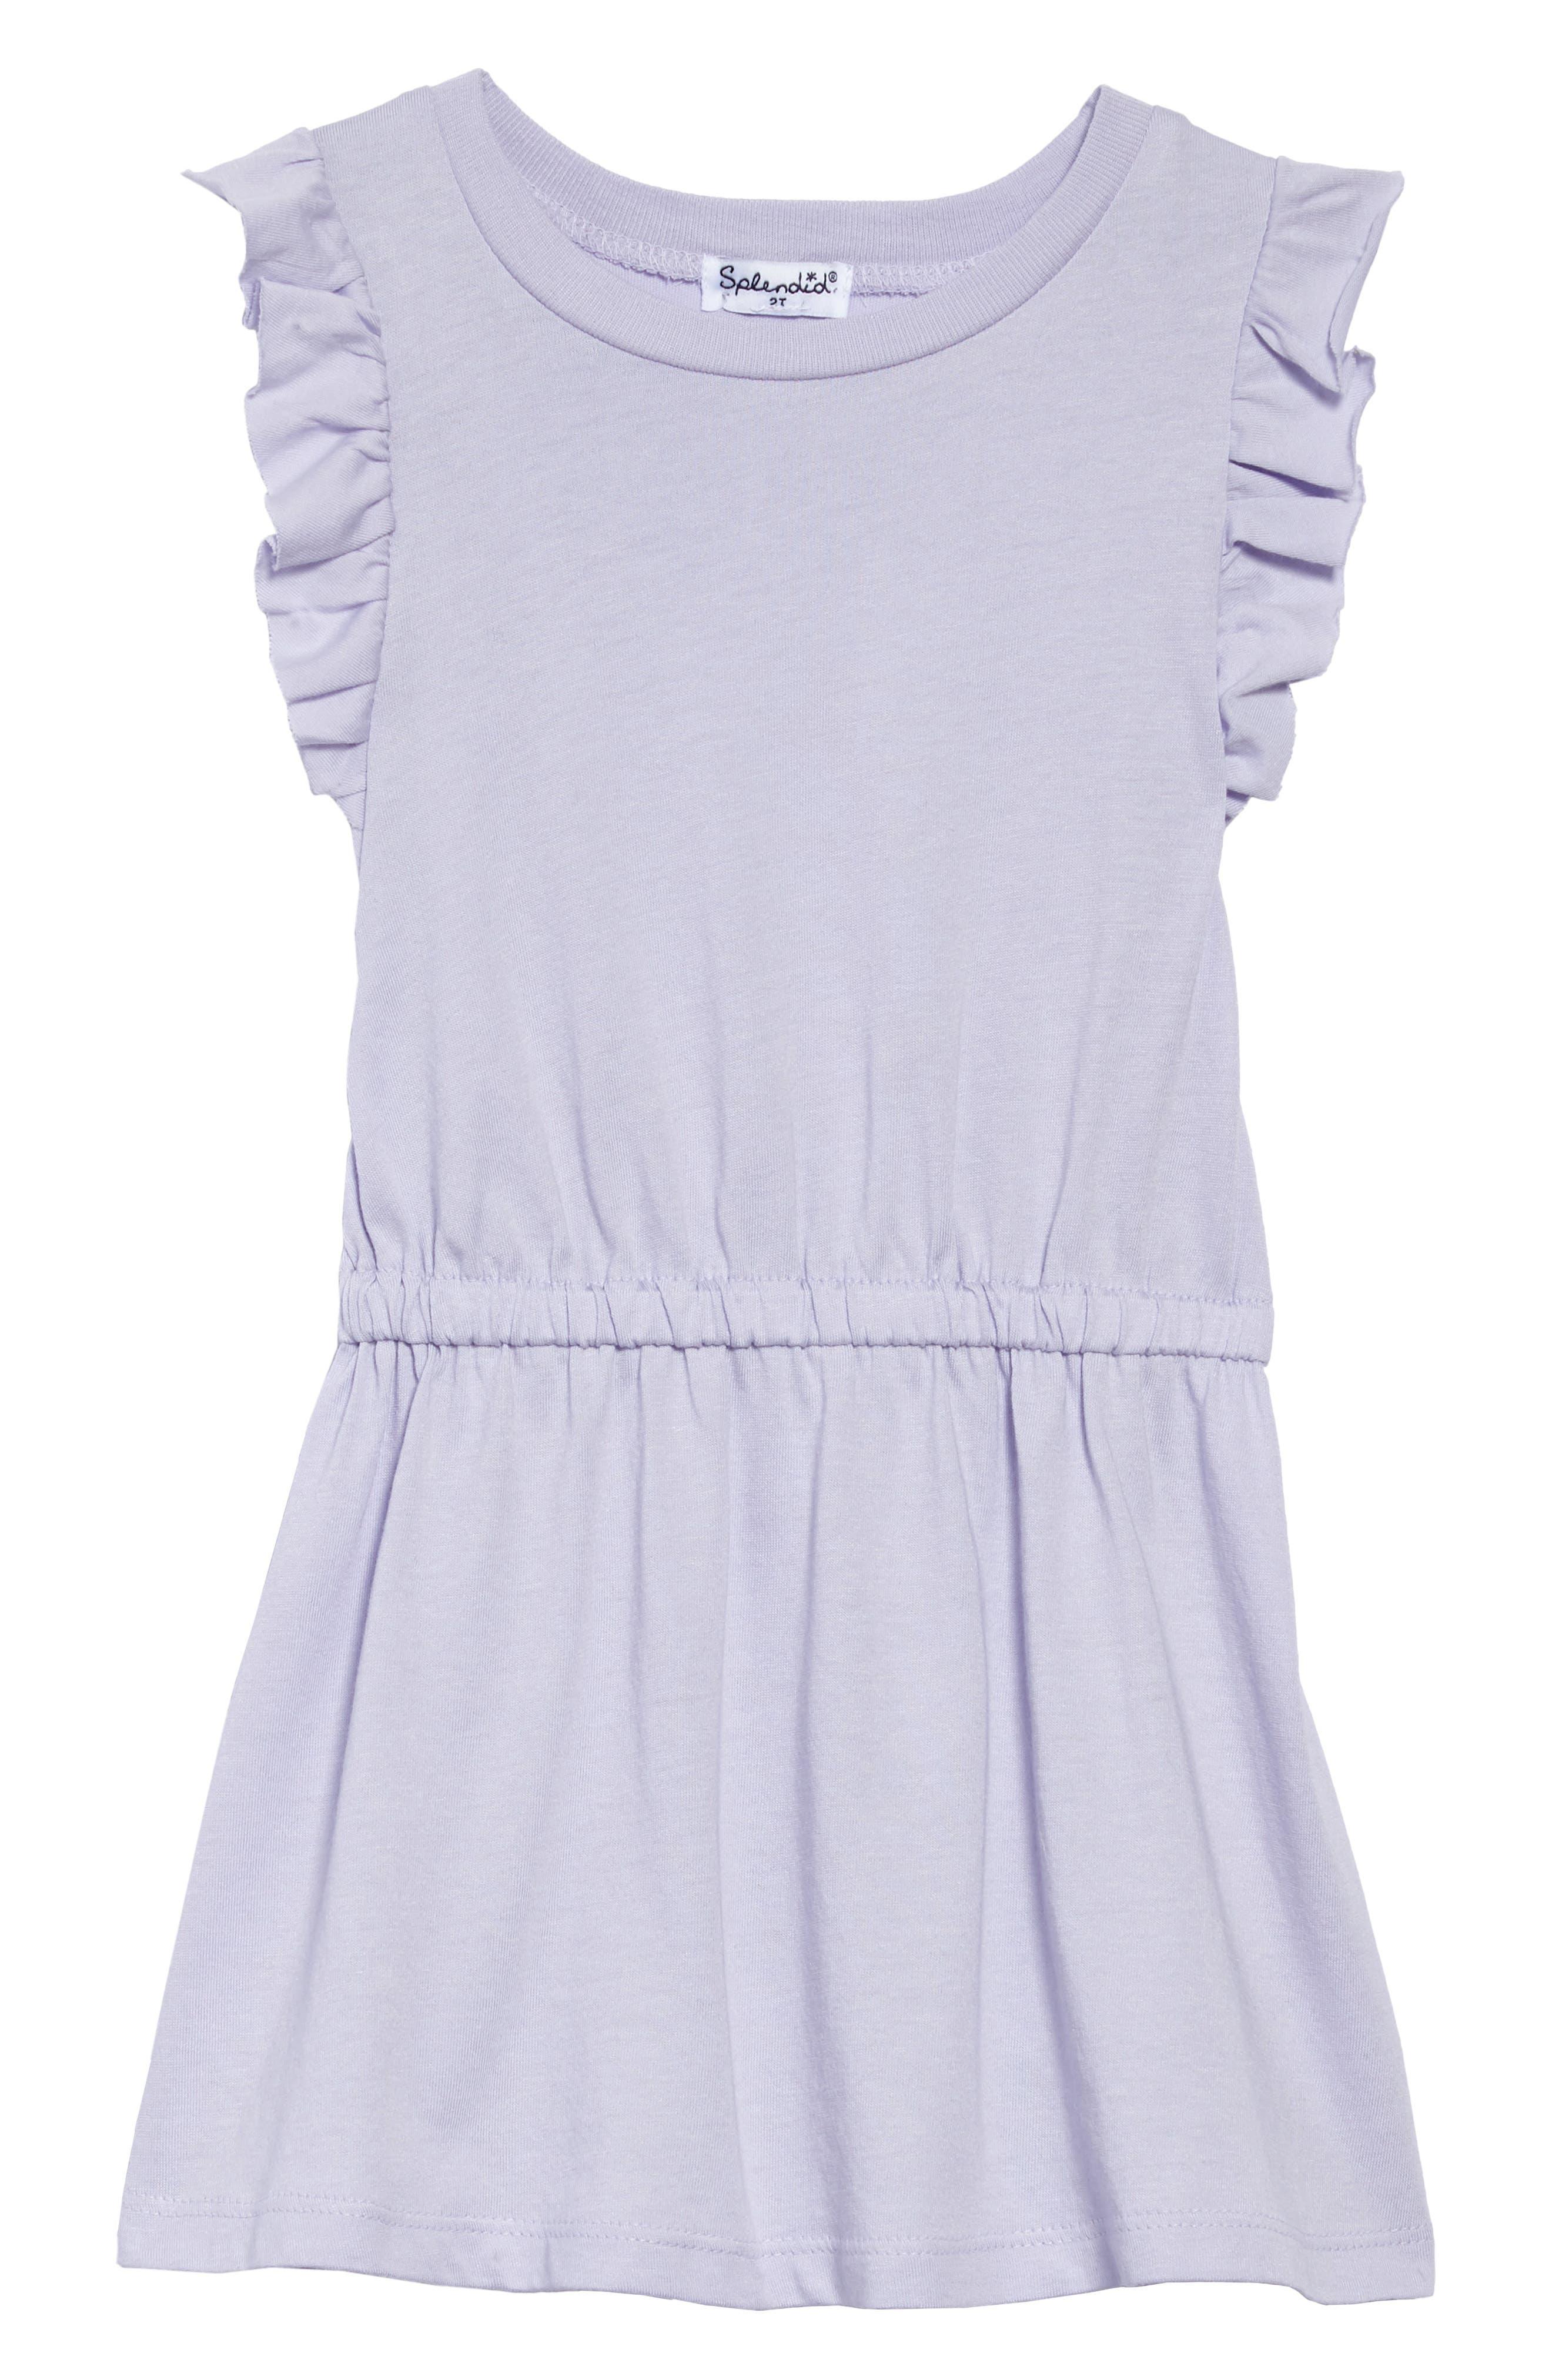 Ruffle Dress,                             Main thumbnail 1, color,                             Purple Heart